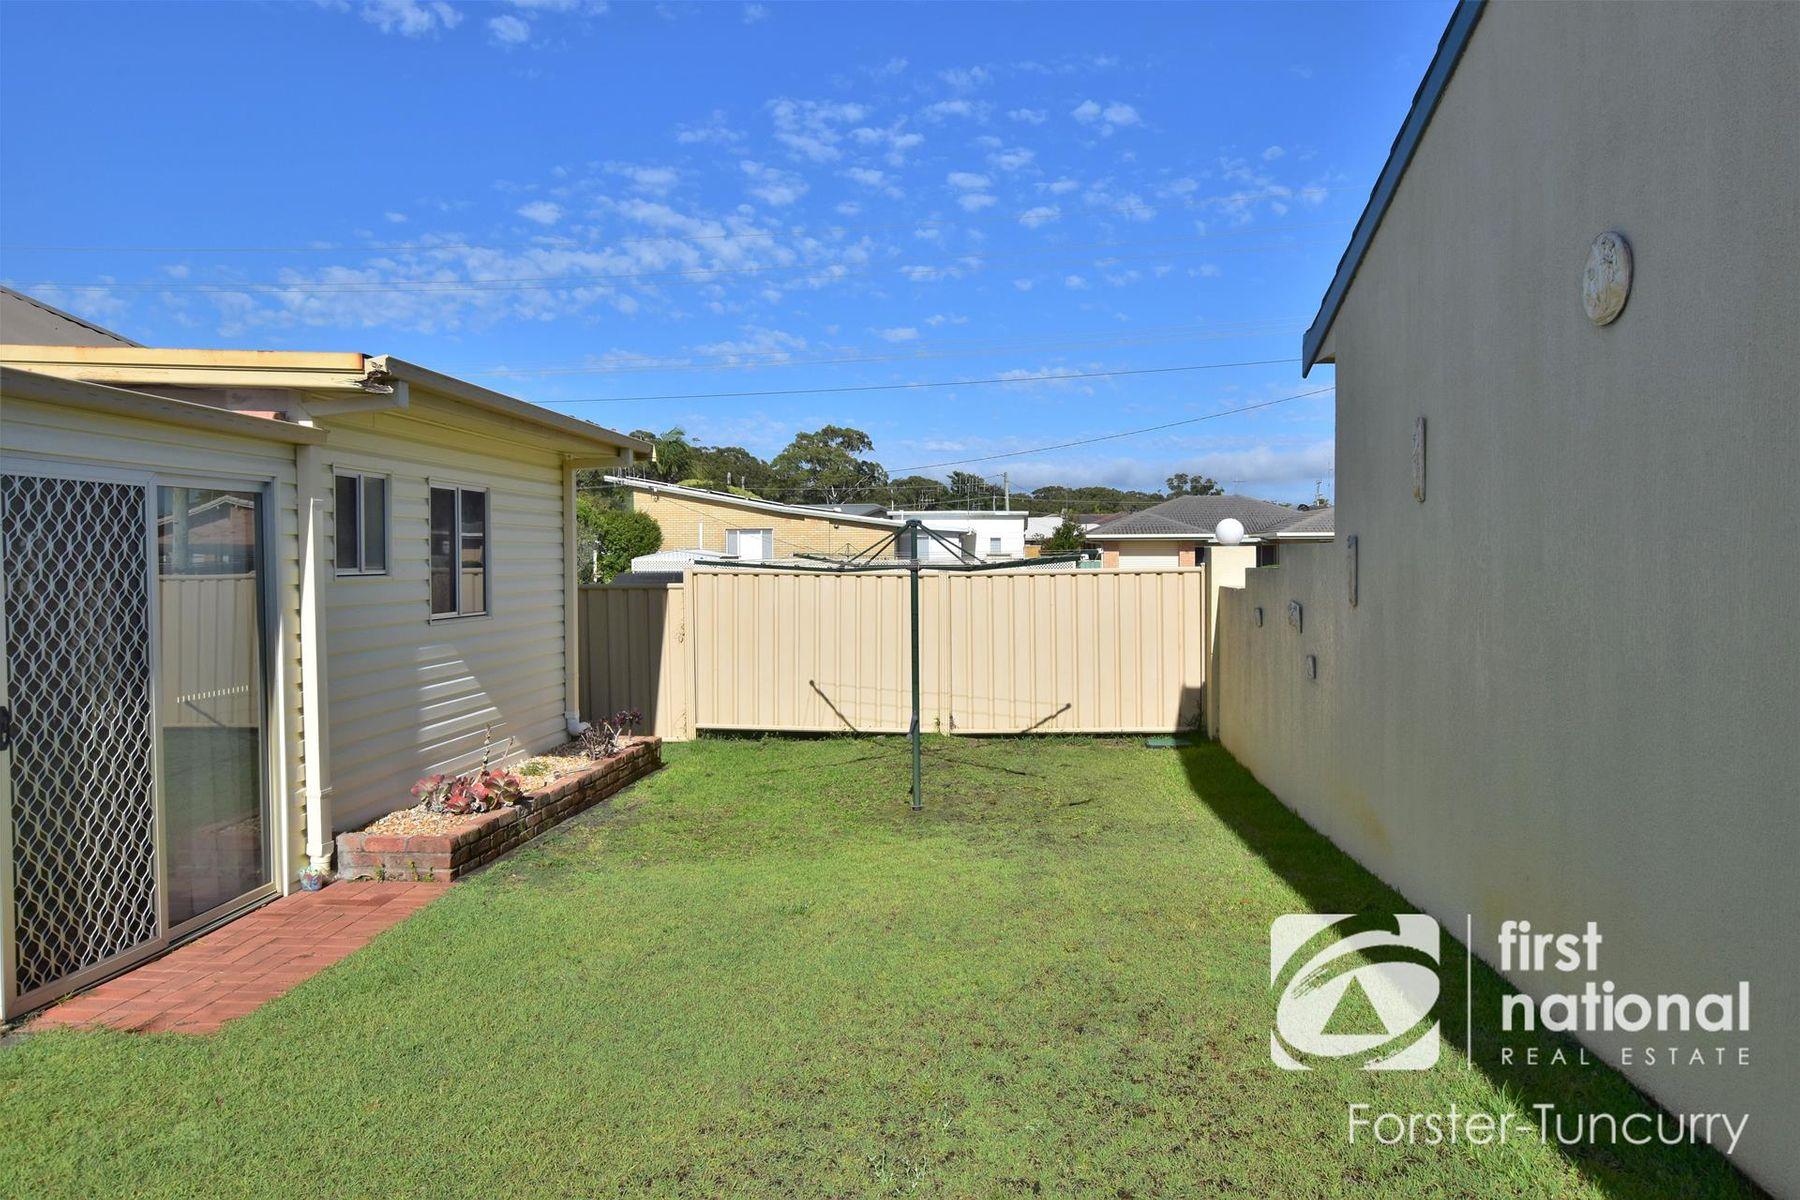 1/27 Wallis Street, Tuncurry, NSW 2428